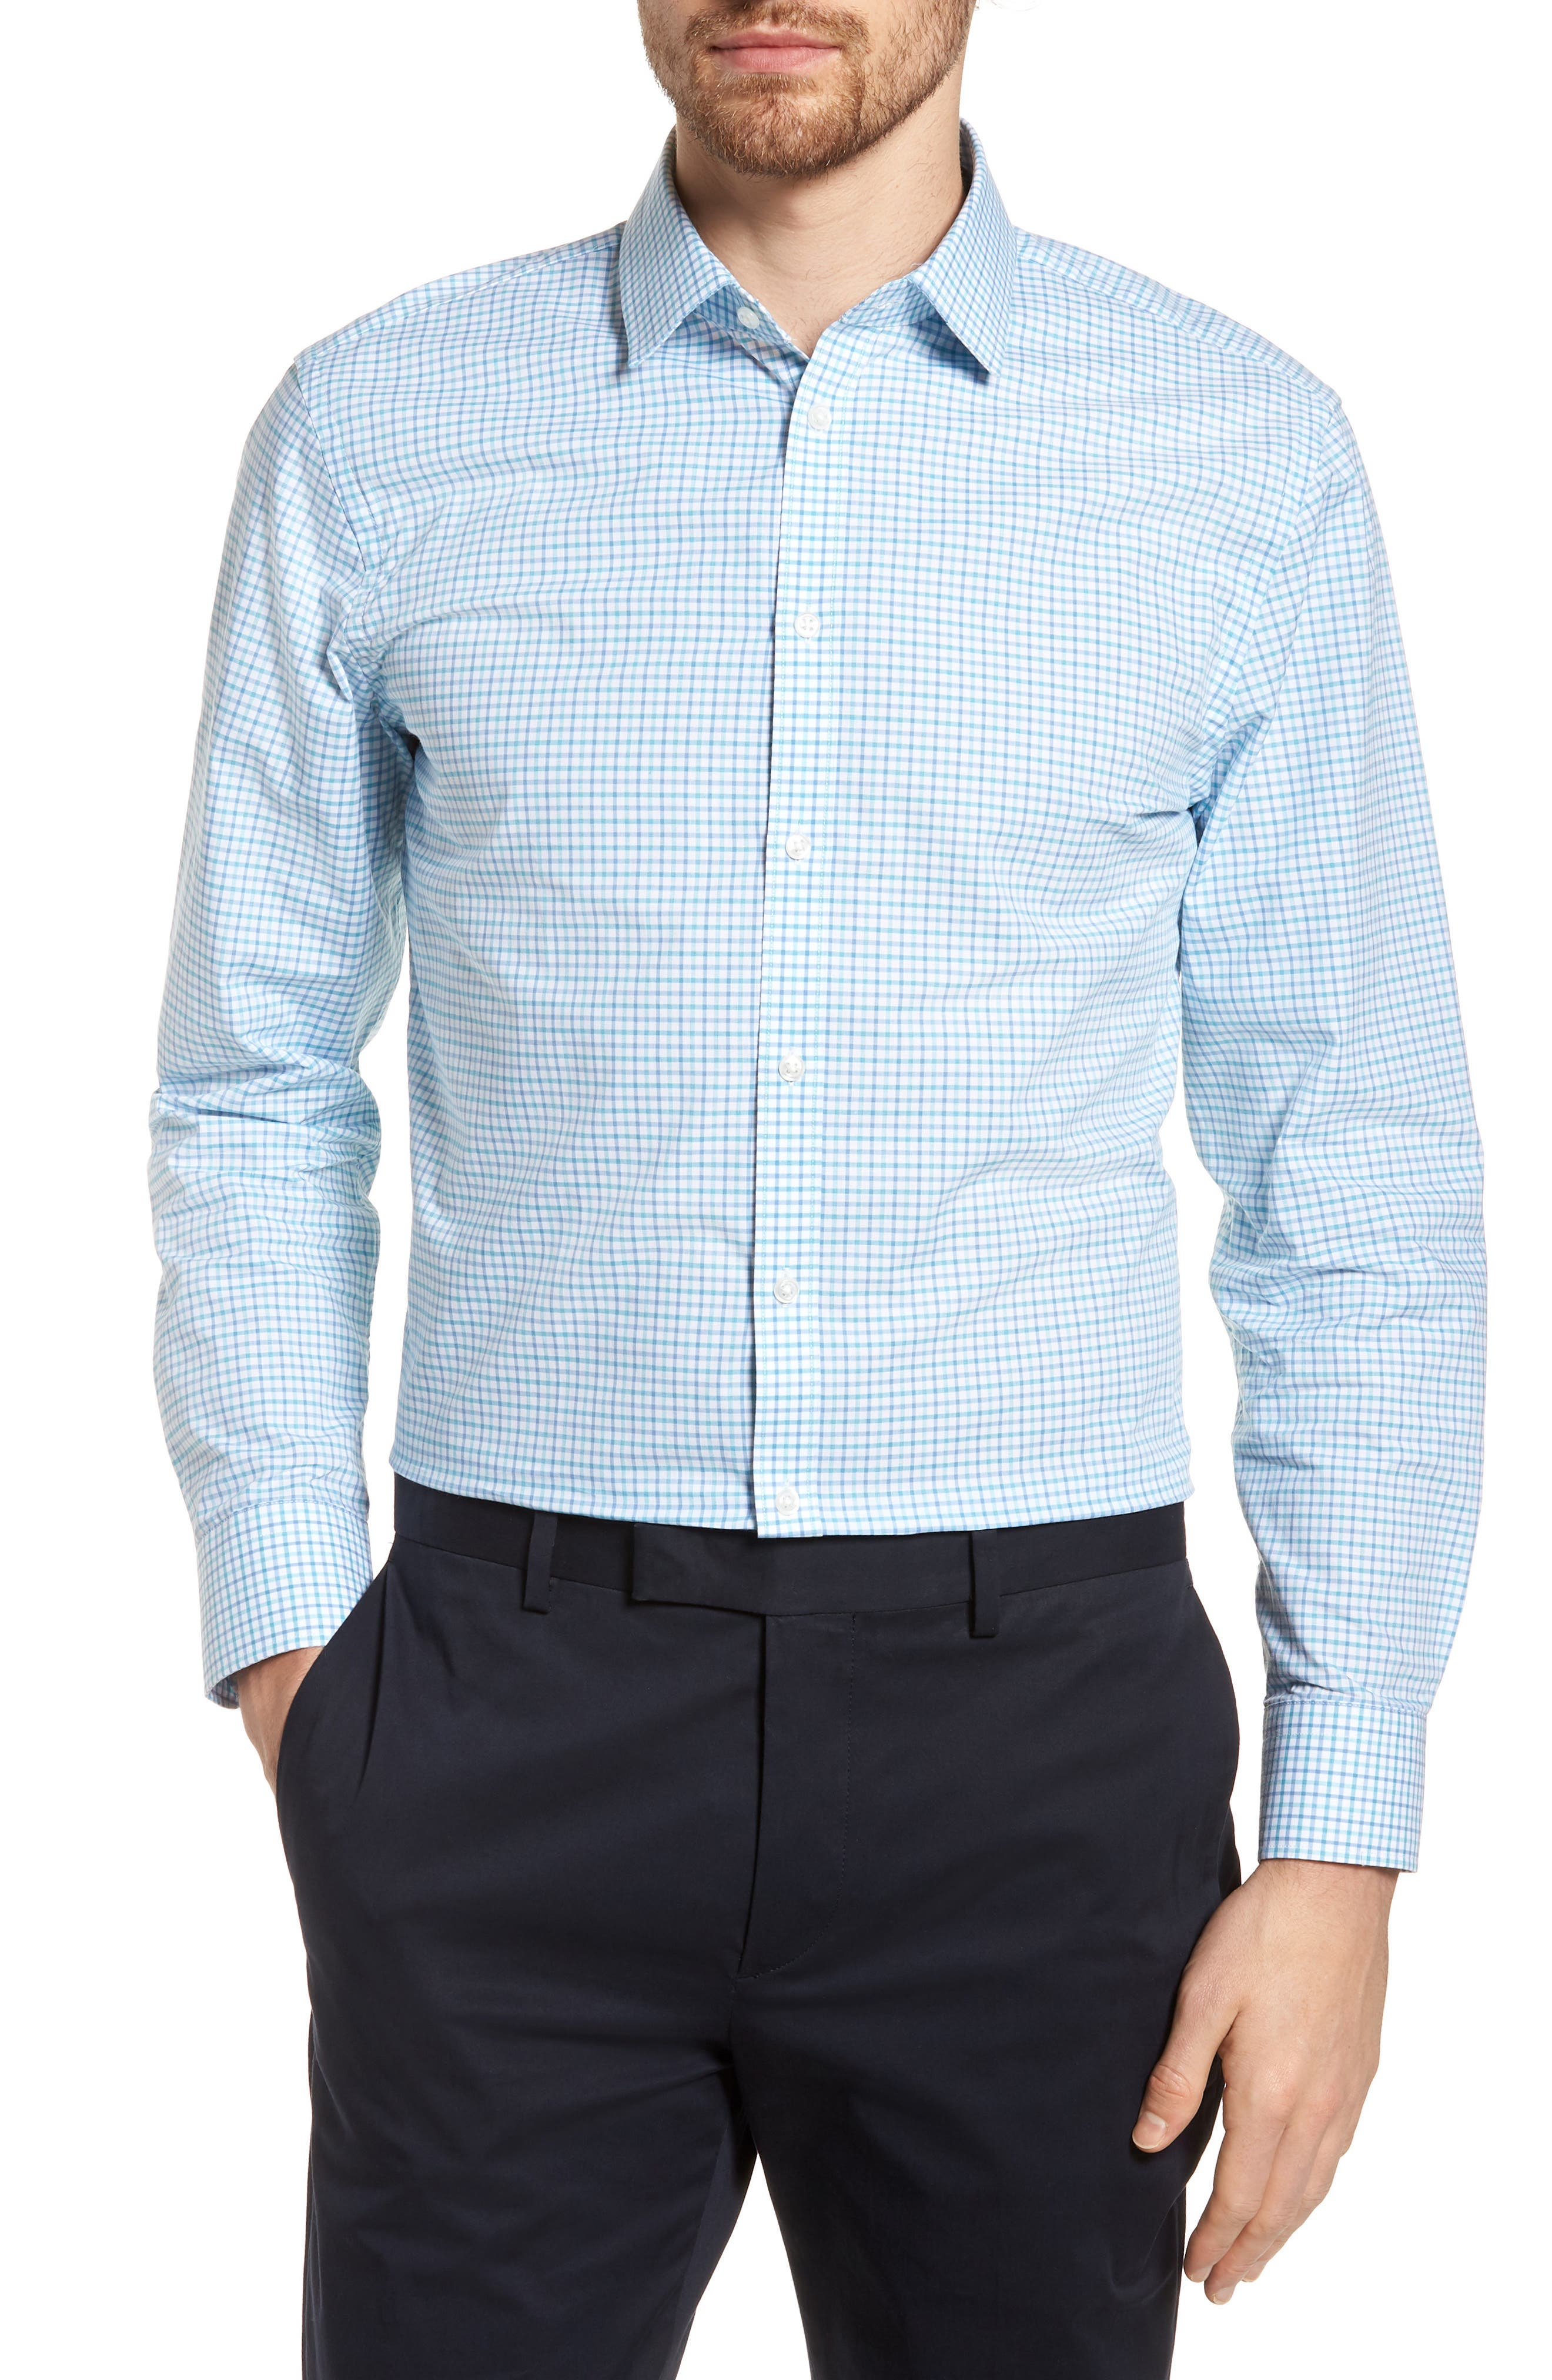 Nordstrom Men's Shop Extra Trim Fit Check Dress Shirt